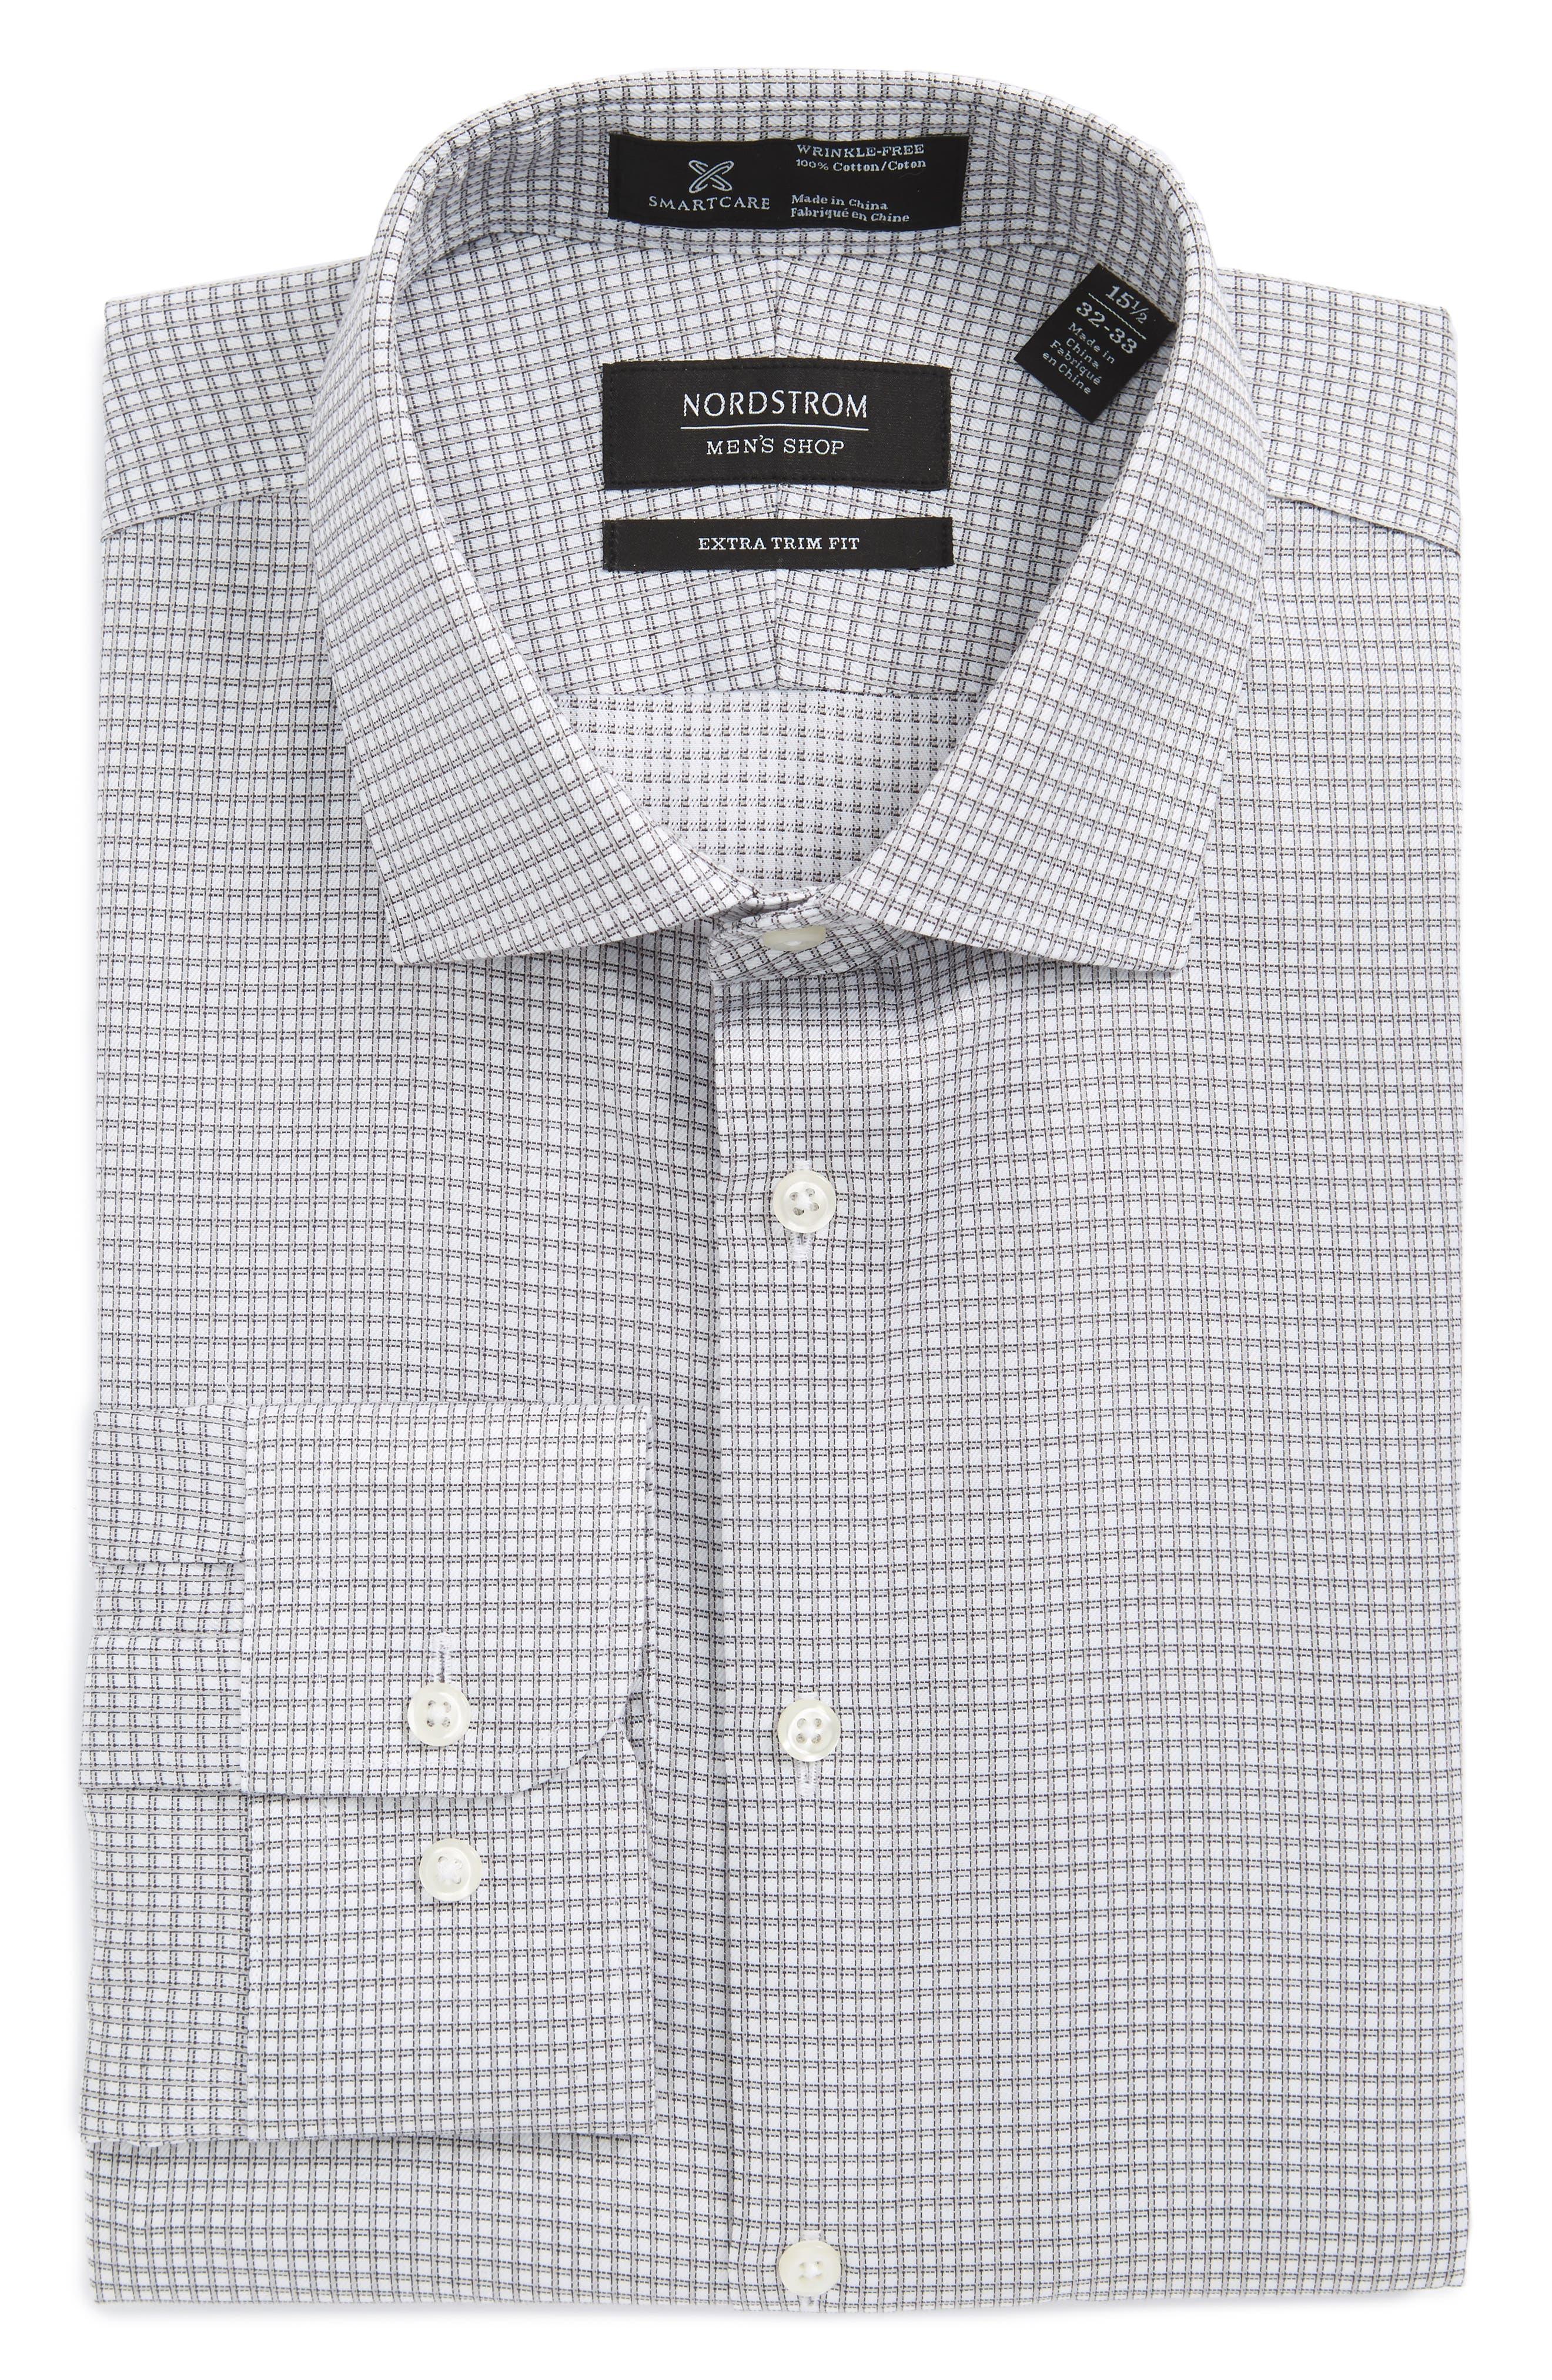 Nordstrom Men's Shop Smartcare™ Extra Trim Fit Check Dress Shirt